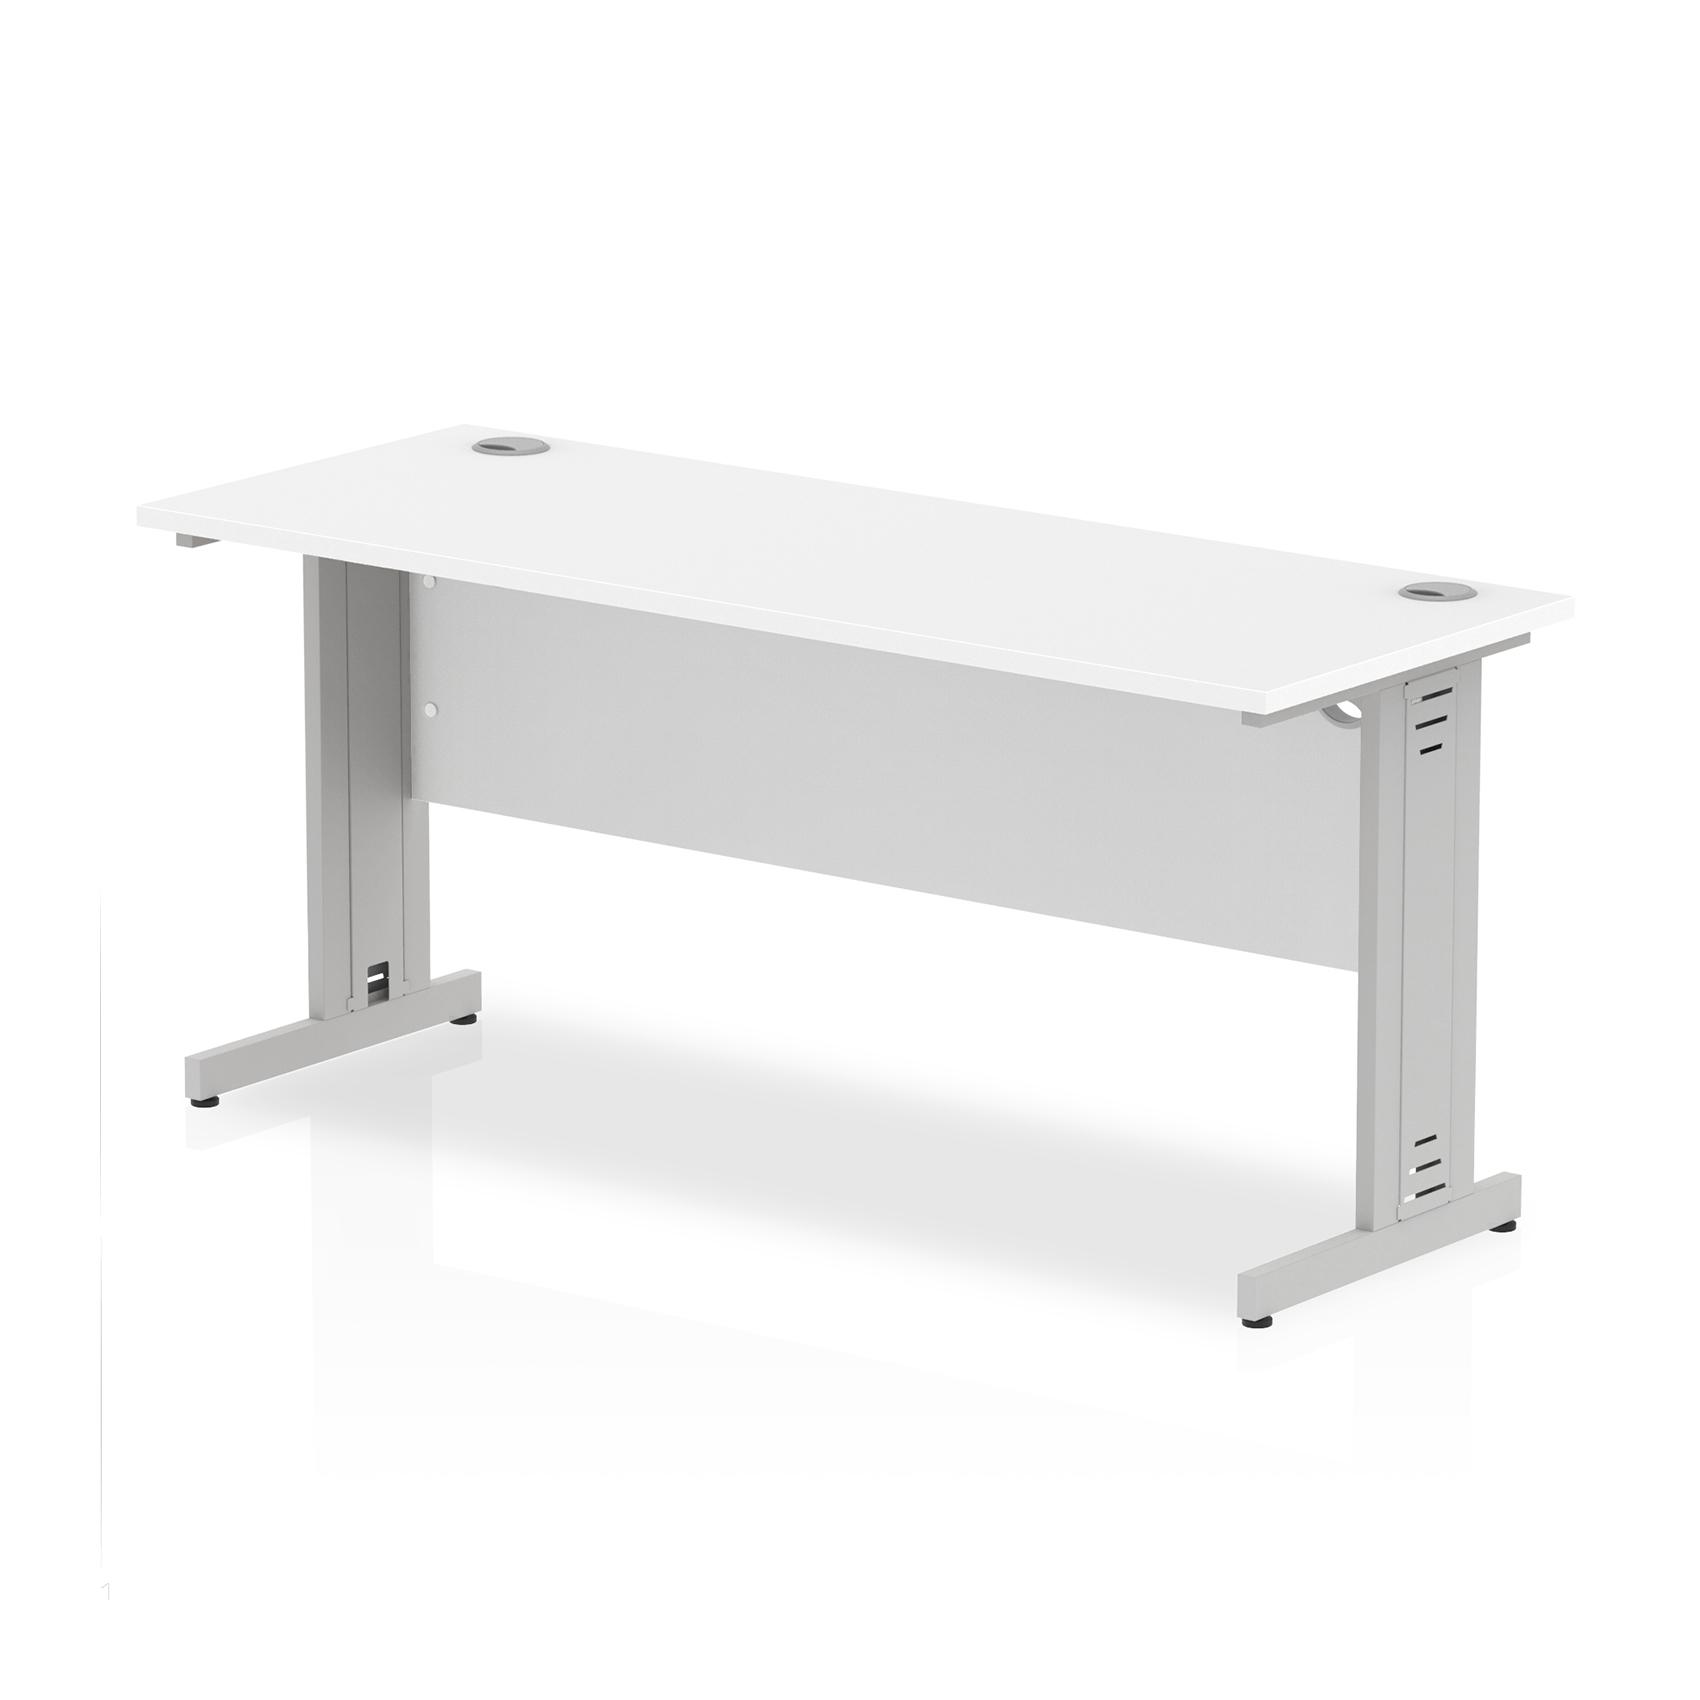 Trexus Desk Rectangle Cable Managed Silver Leg 1600x600mm White Ref MI002278